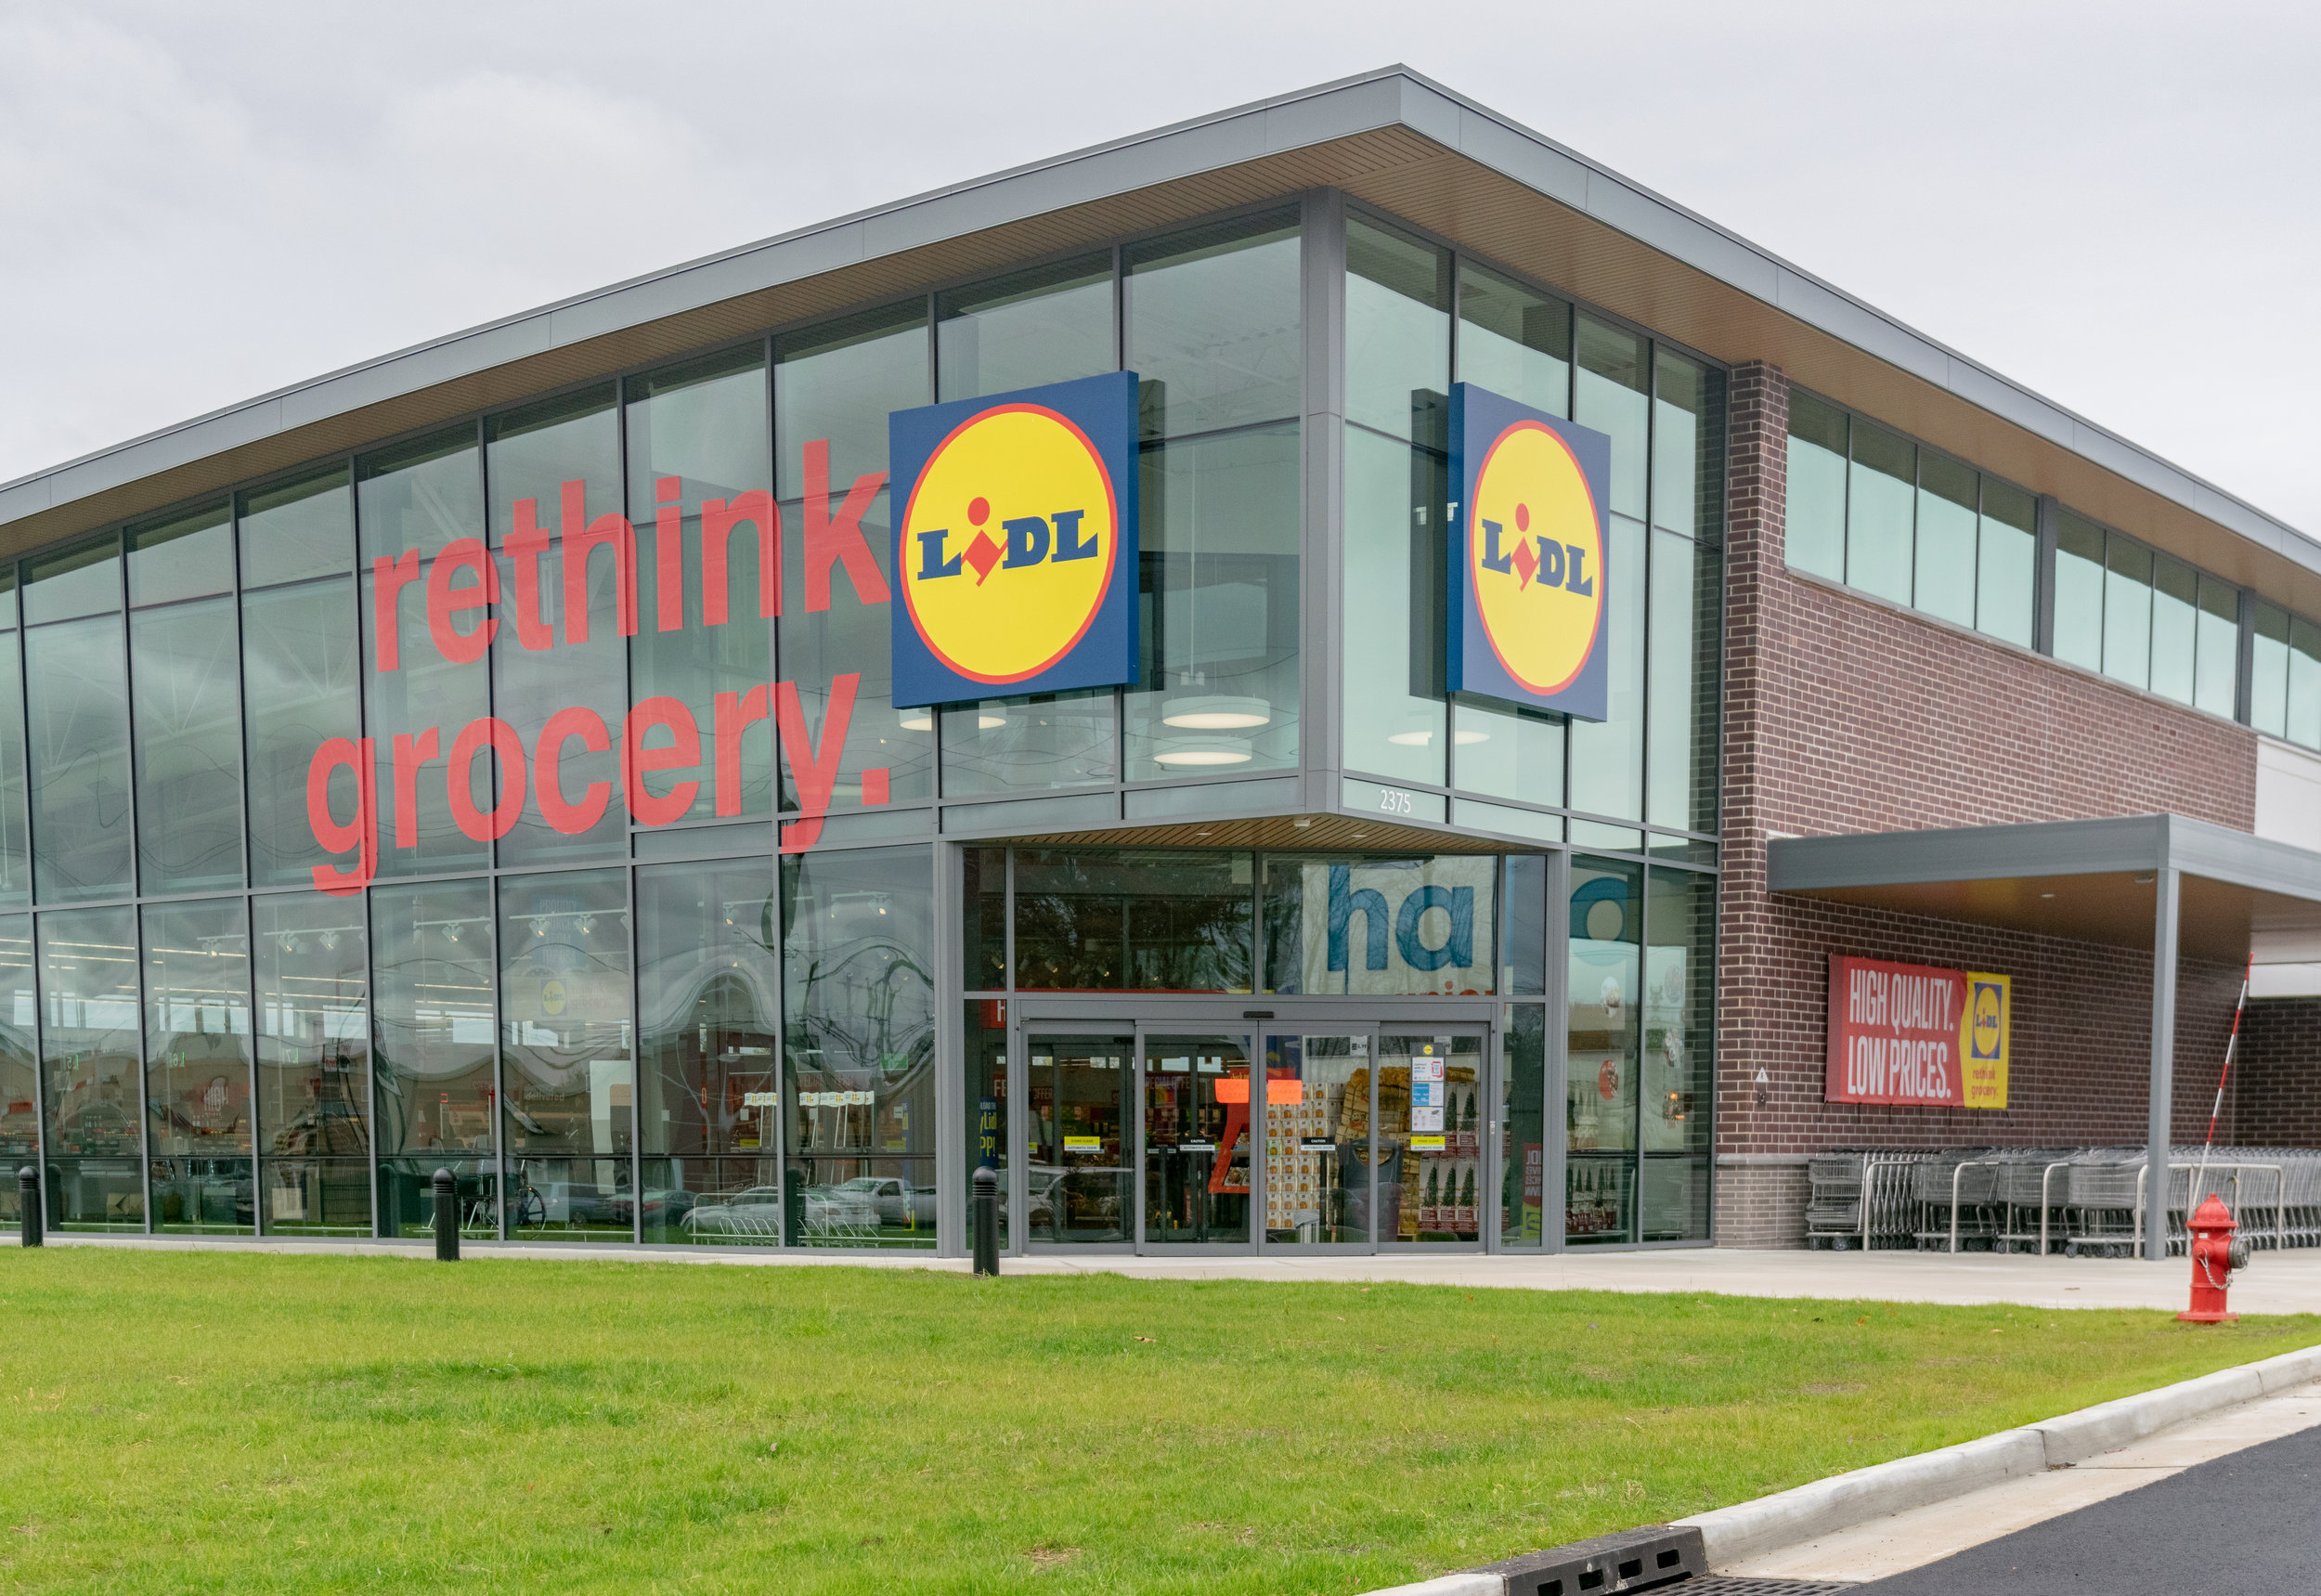 LIDL Supermarket in Union Exterior Building